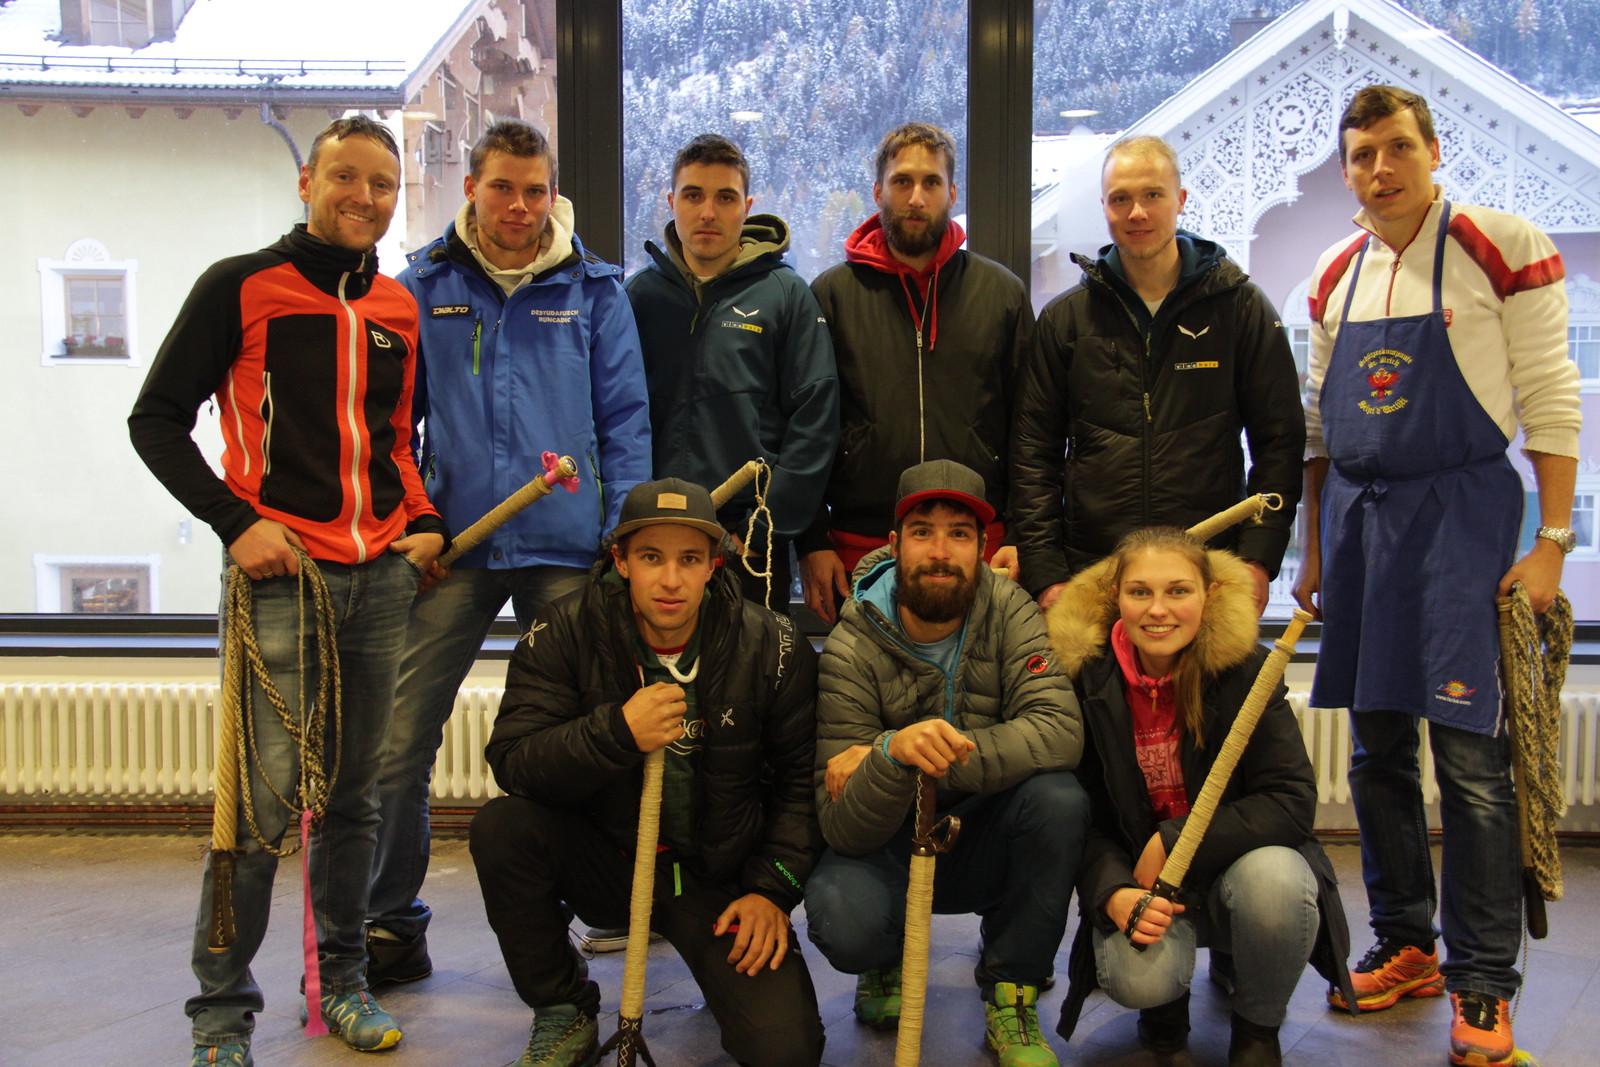 Goasslaukurs in St. Ulrich, 09-10.11.2019